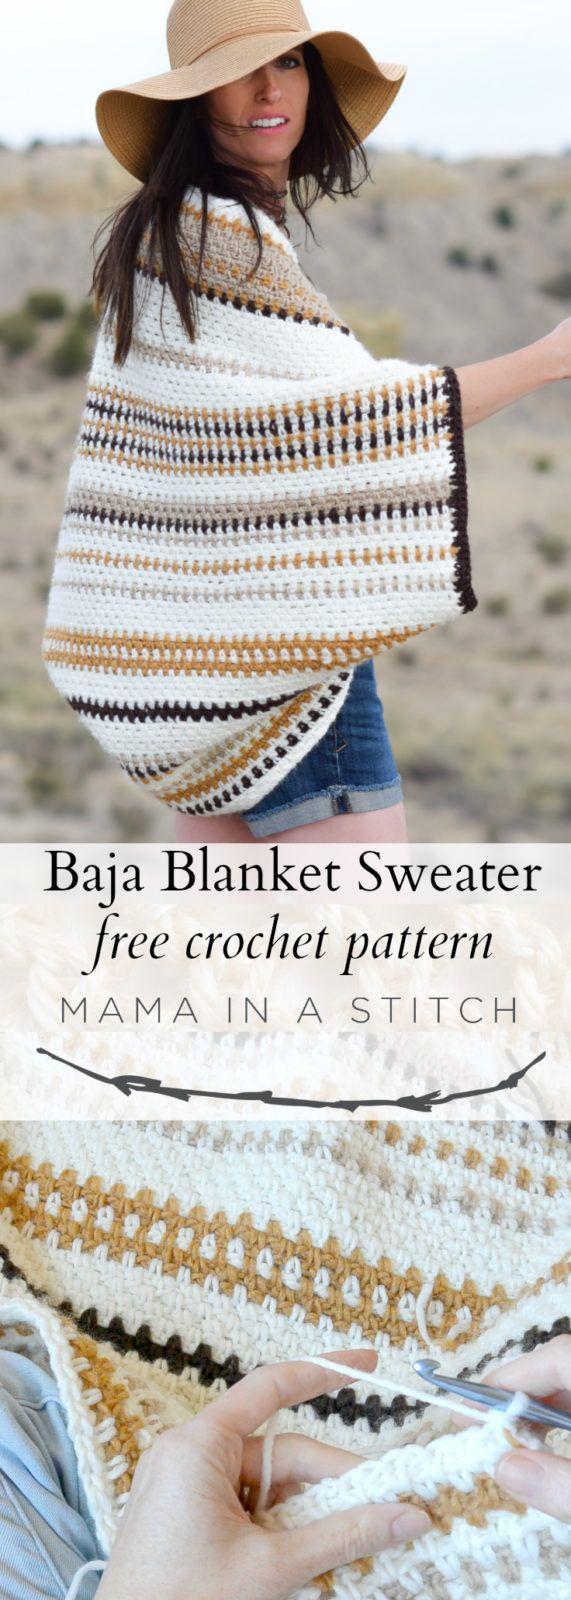 Mejores 6912 imágenes de crochet en Pinterest   Patrones de ...